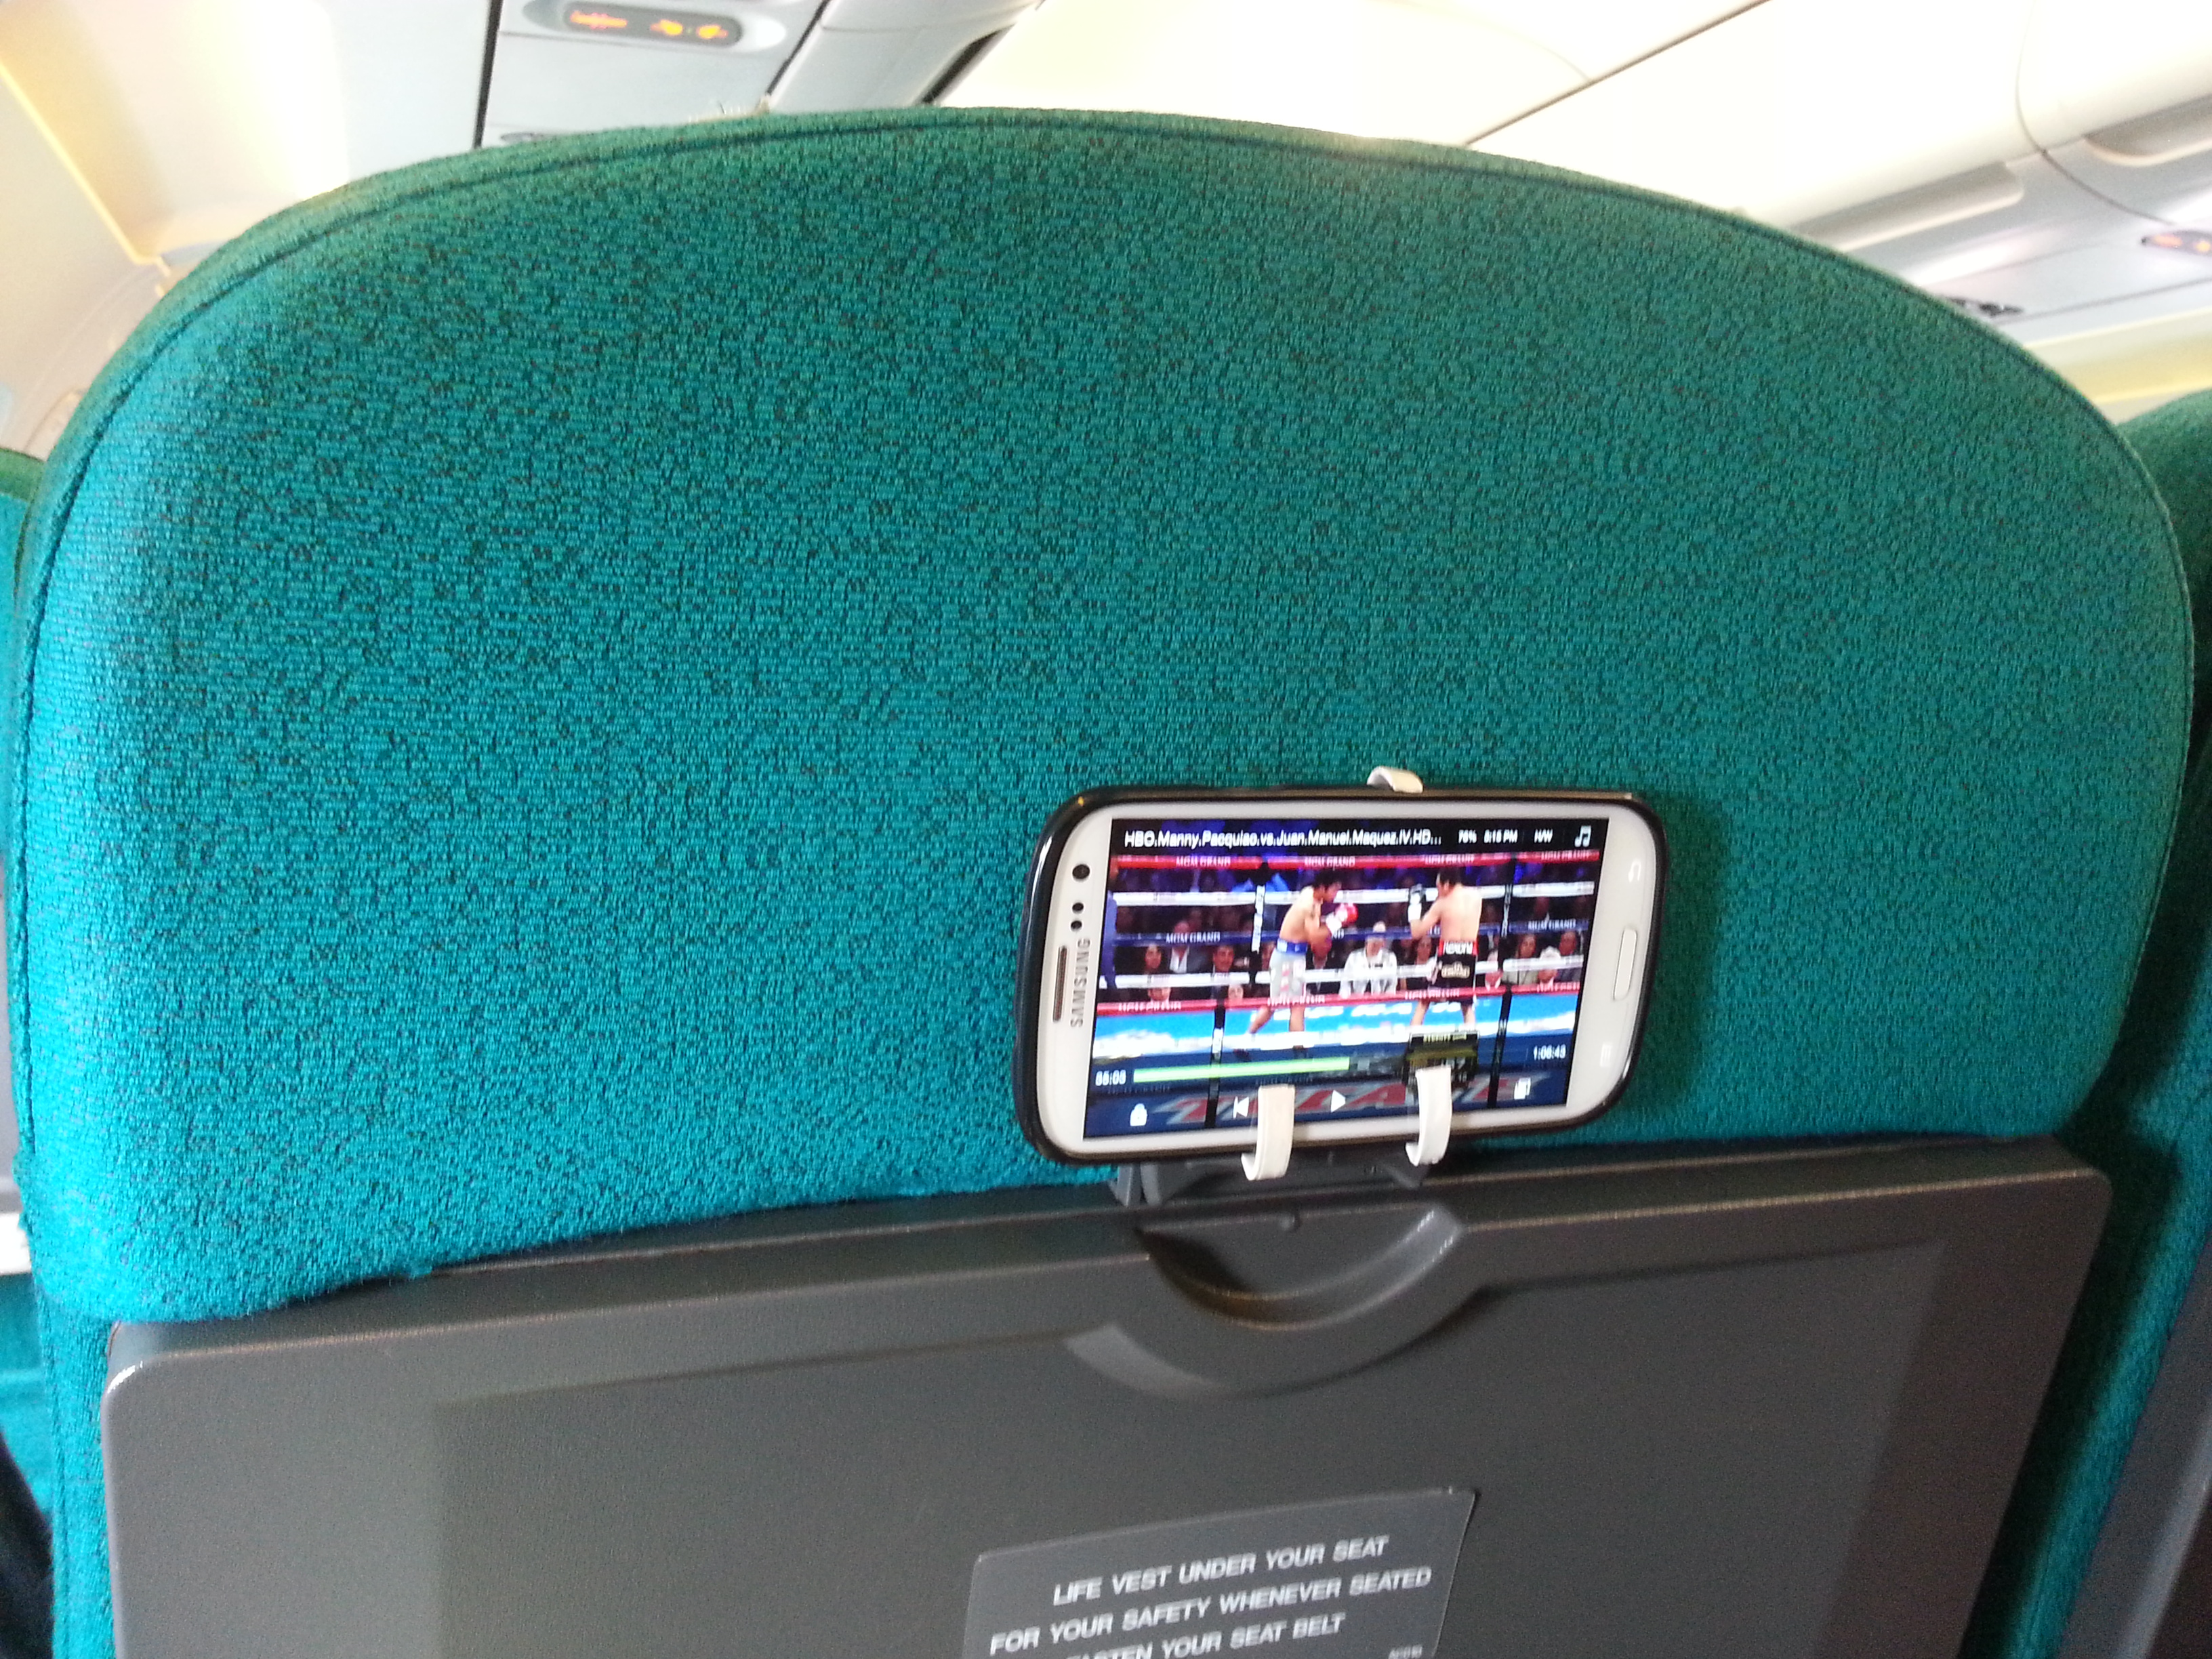 Phone Mount on Plane Seat